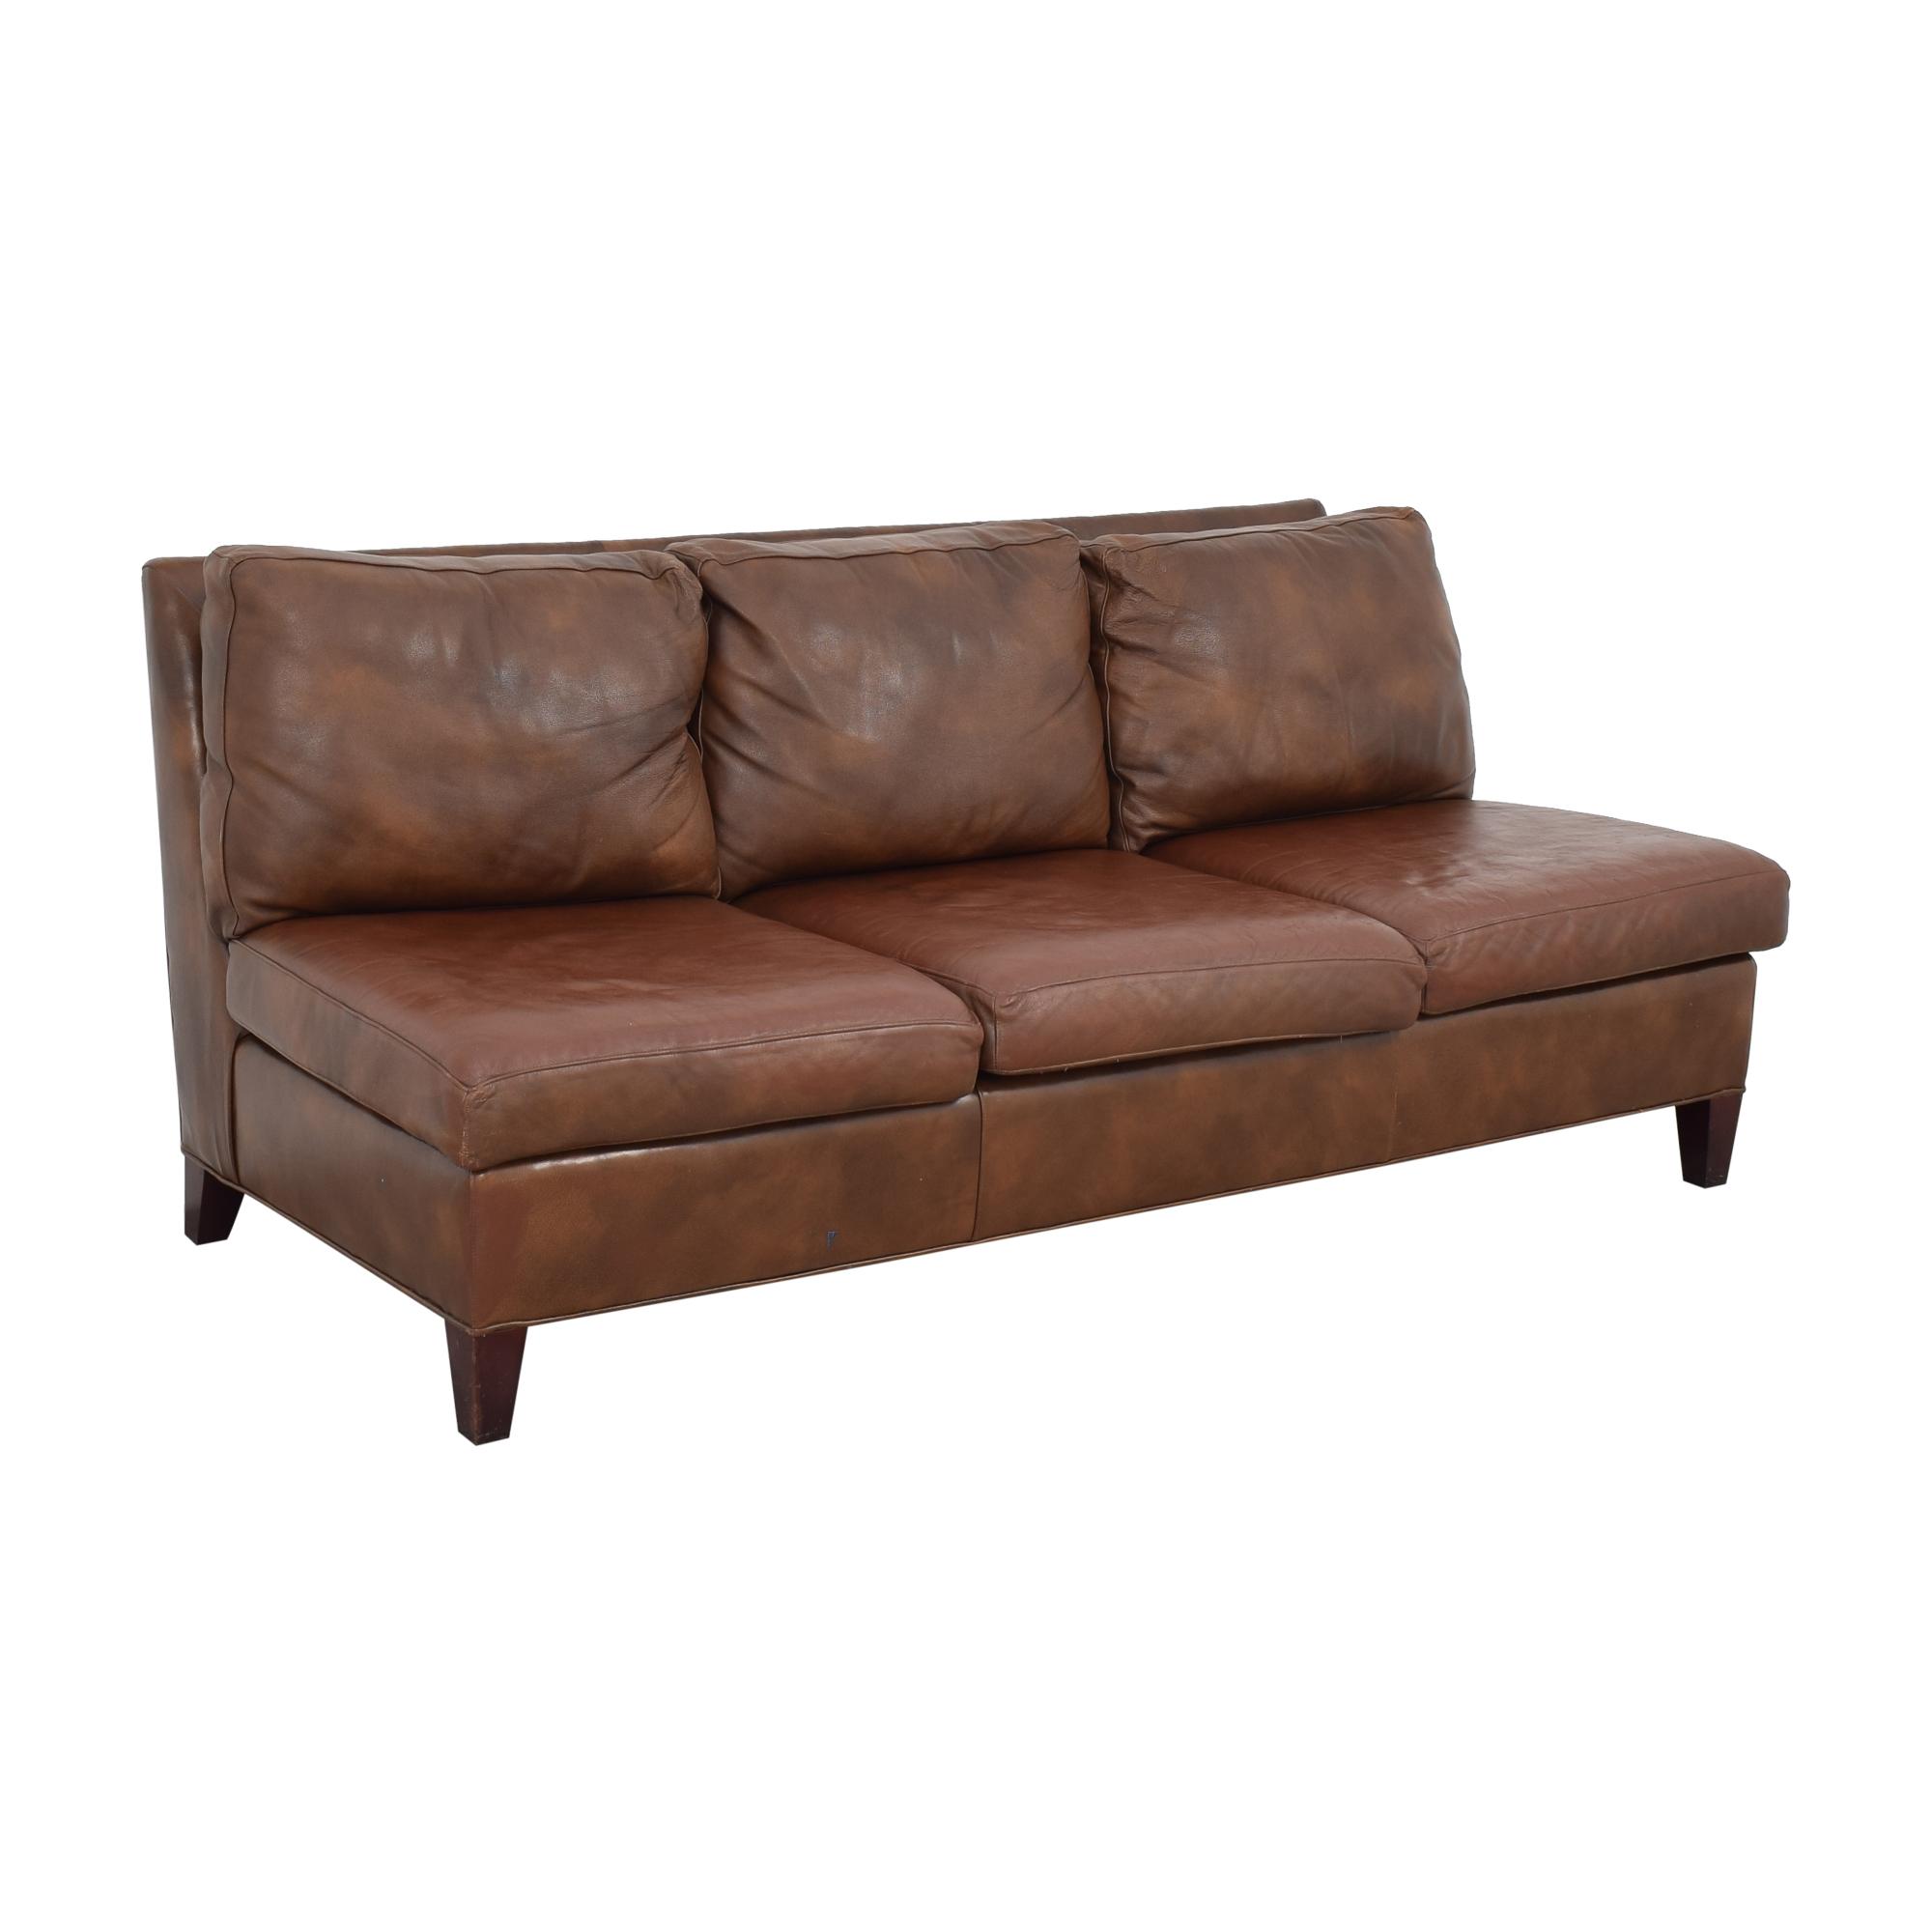 McKinley Leather Furniture McKinley Leather Furniture Armless Sofa pa